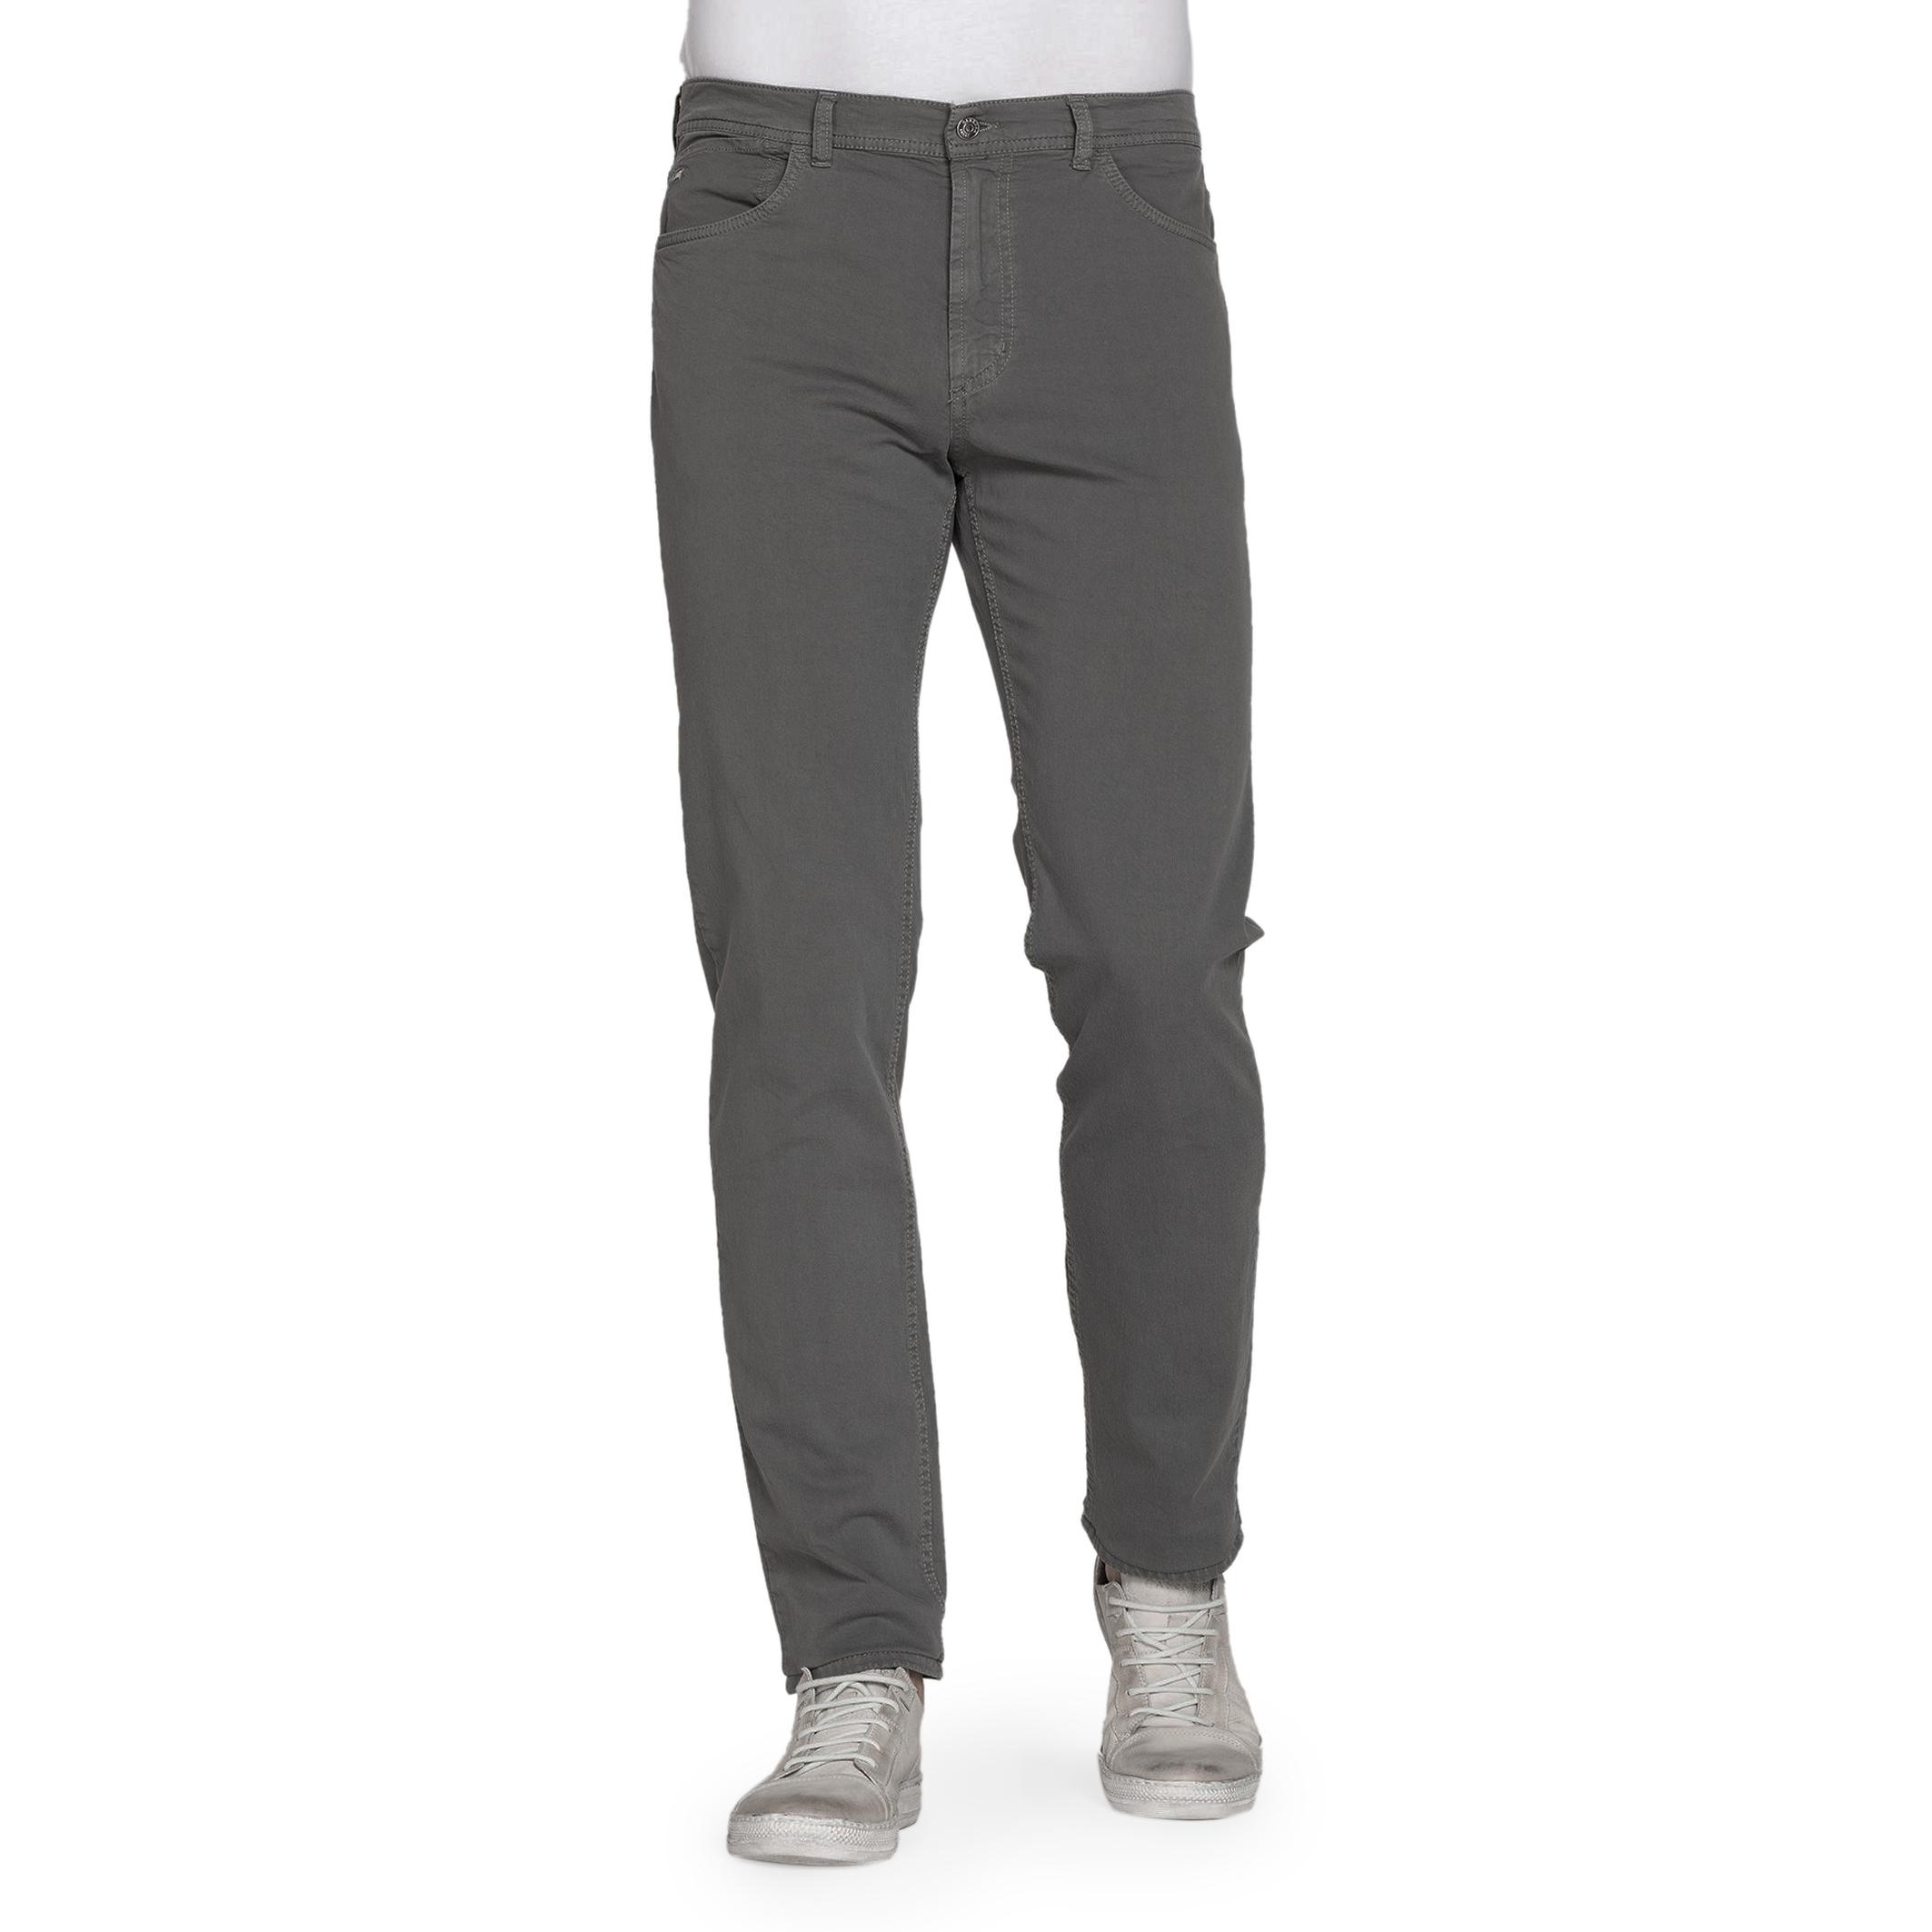 Carrera Jeans 700-942A